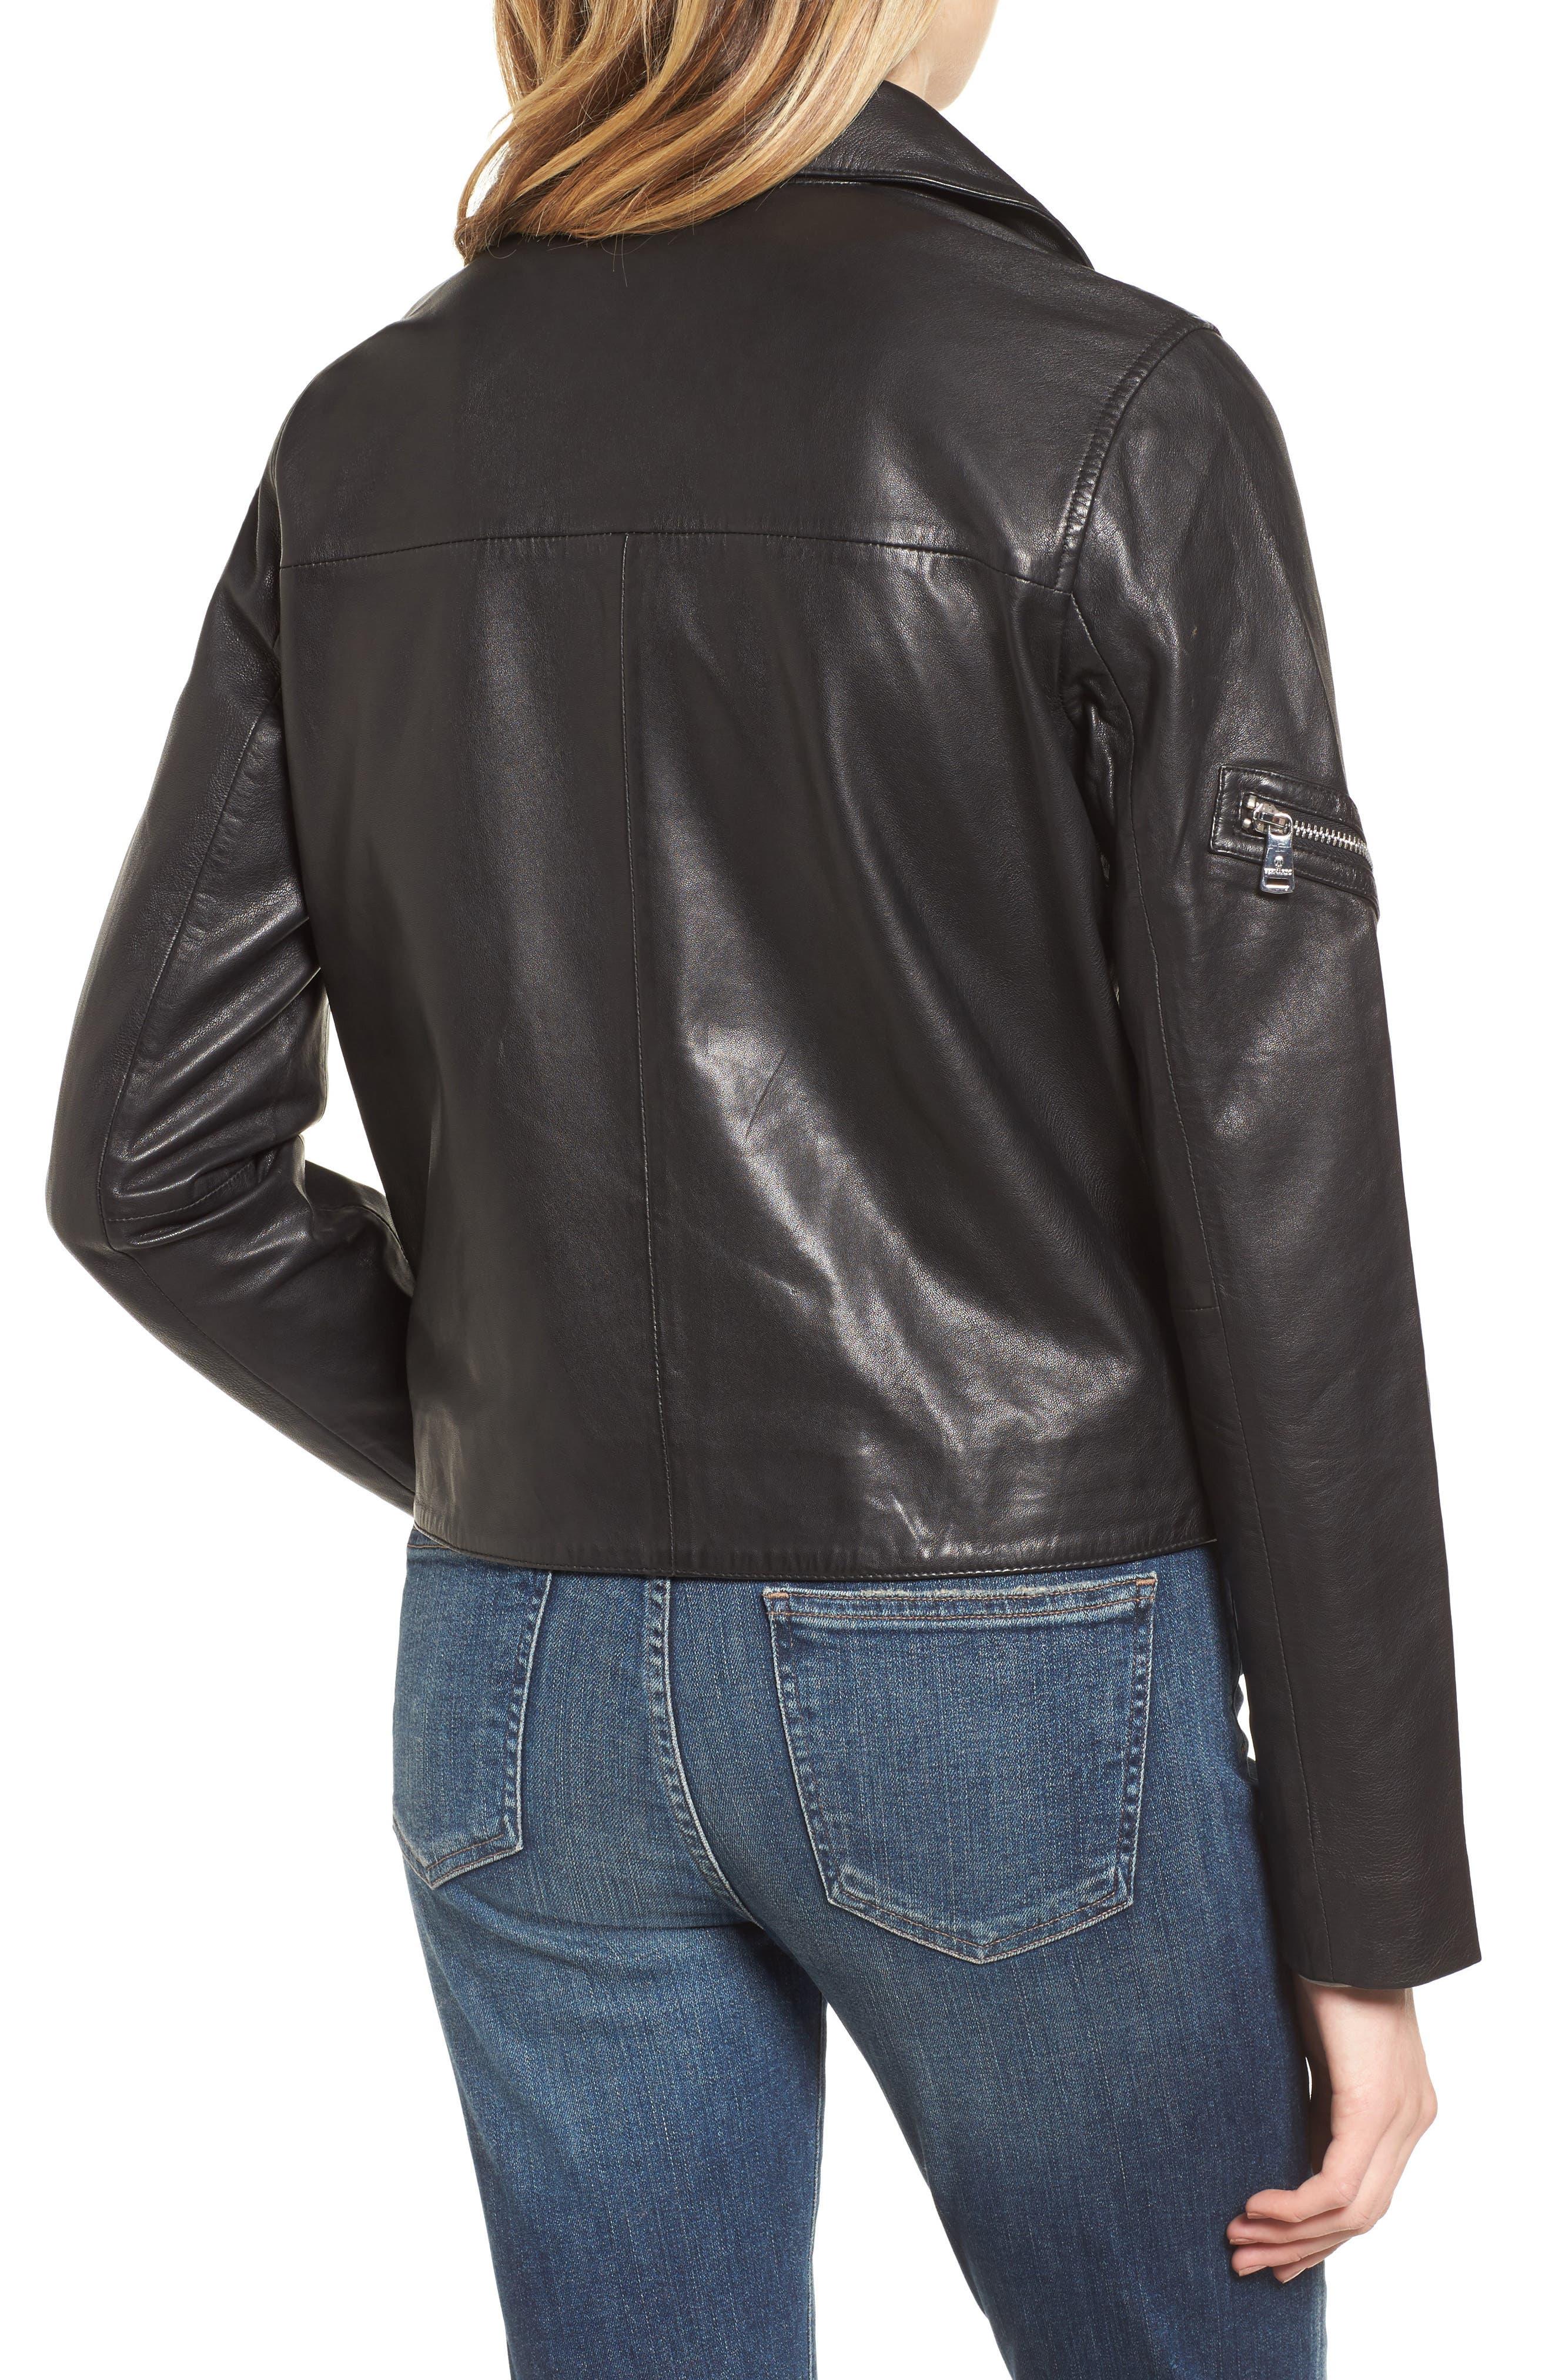 Kirwin Leather Moto Jacket,                             Alternate thumbnail 2, color,                             001